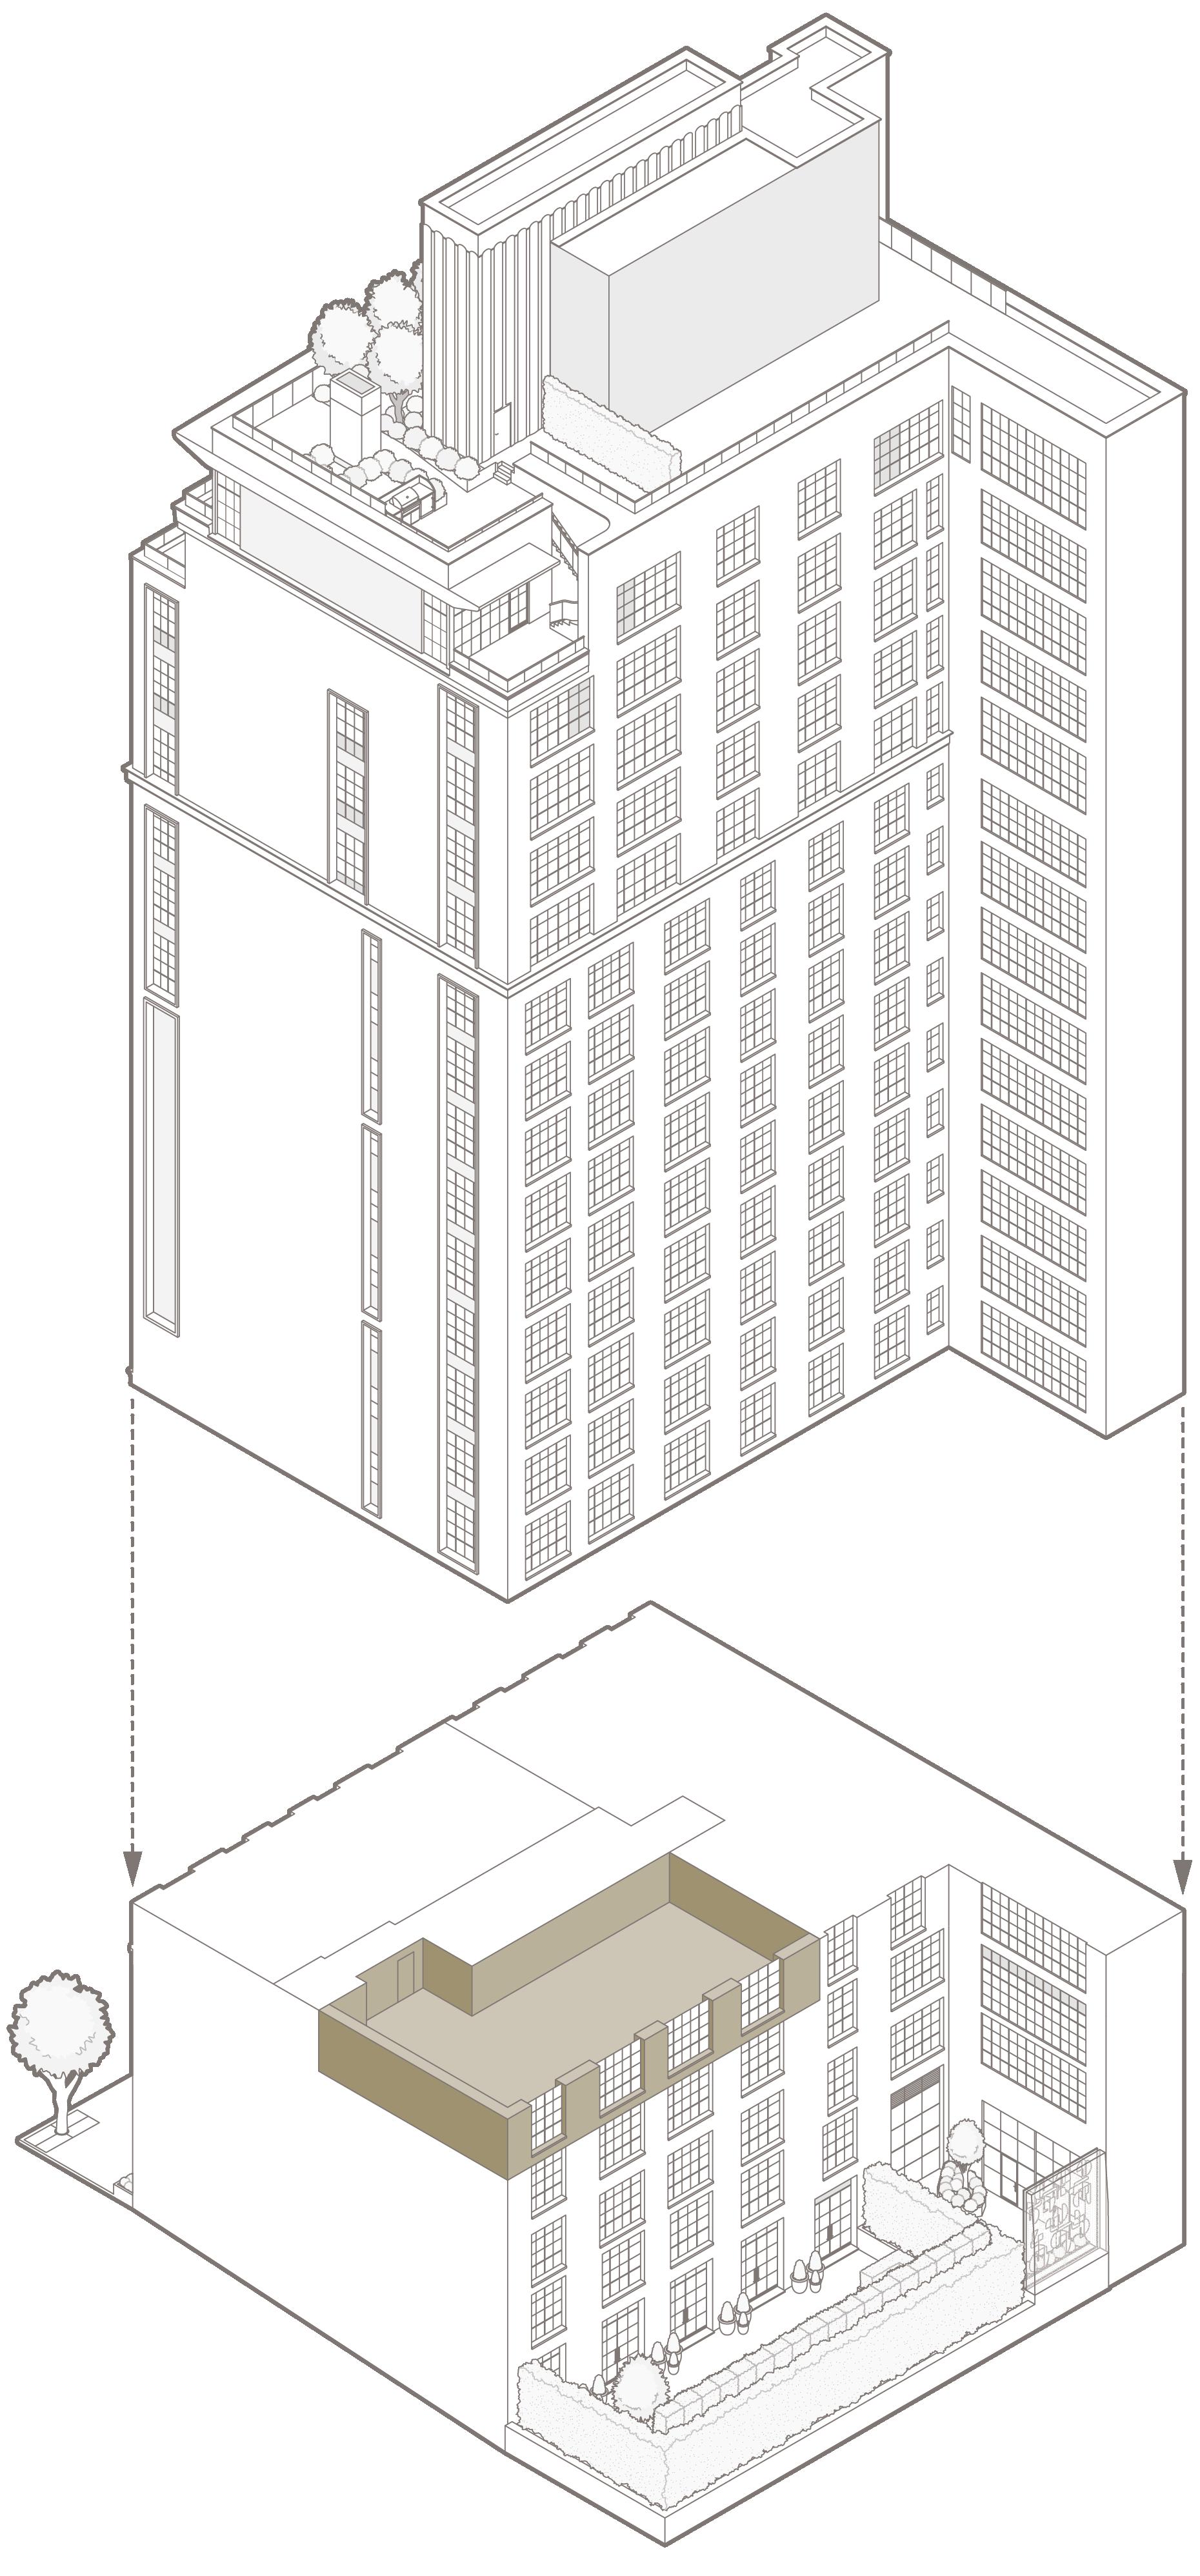 5 North – North elevation